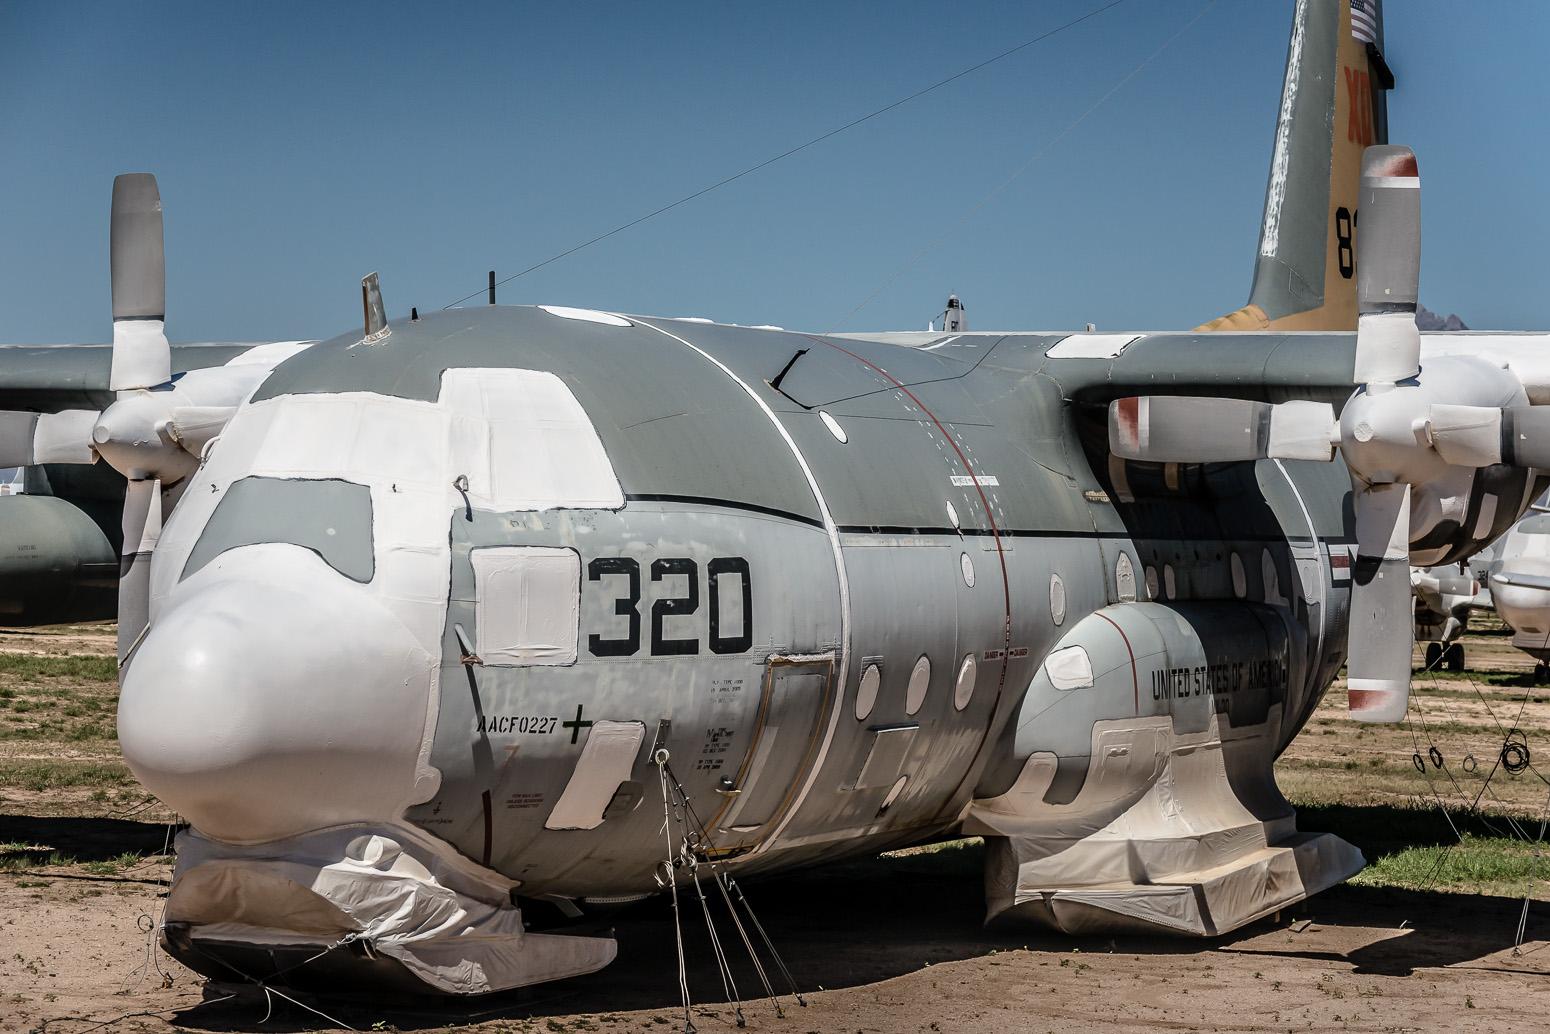 Lockheed LC-130 Hercules, The Boneyard, Davis-Monthan Air Force Base, Tucson, USA